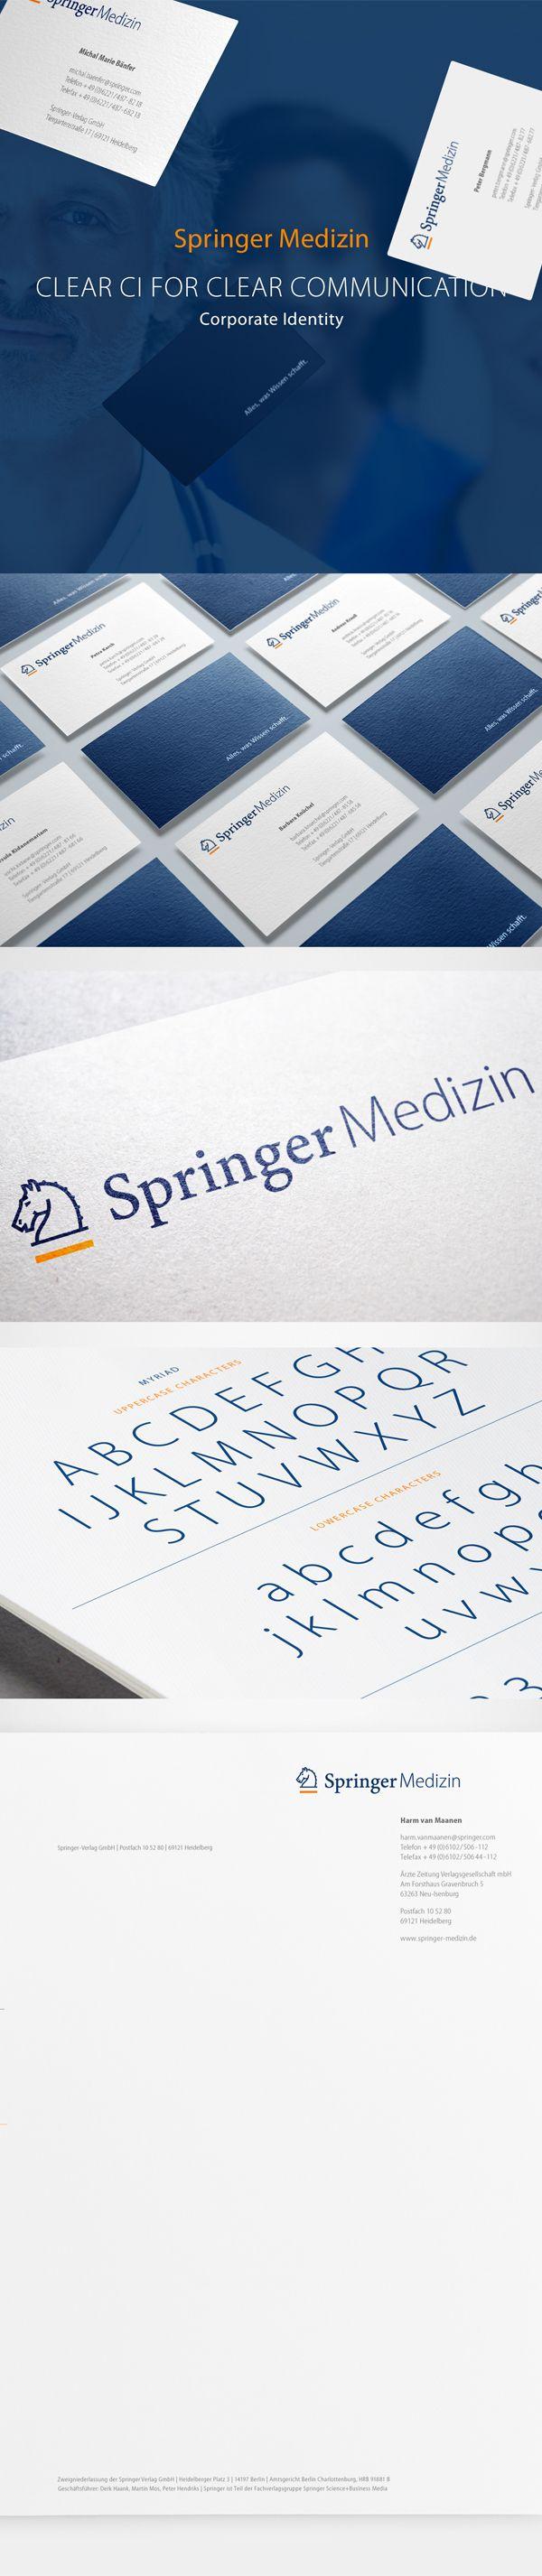 Springer Medizin Corporate Identity on Behance